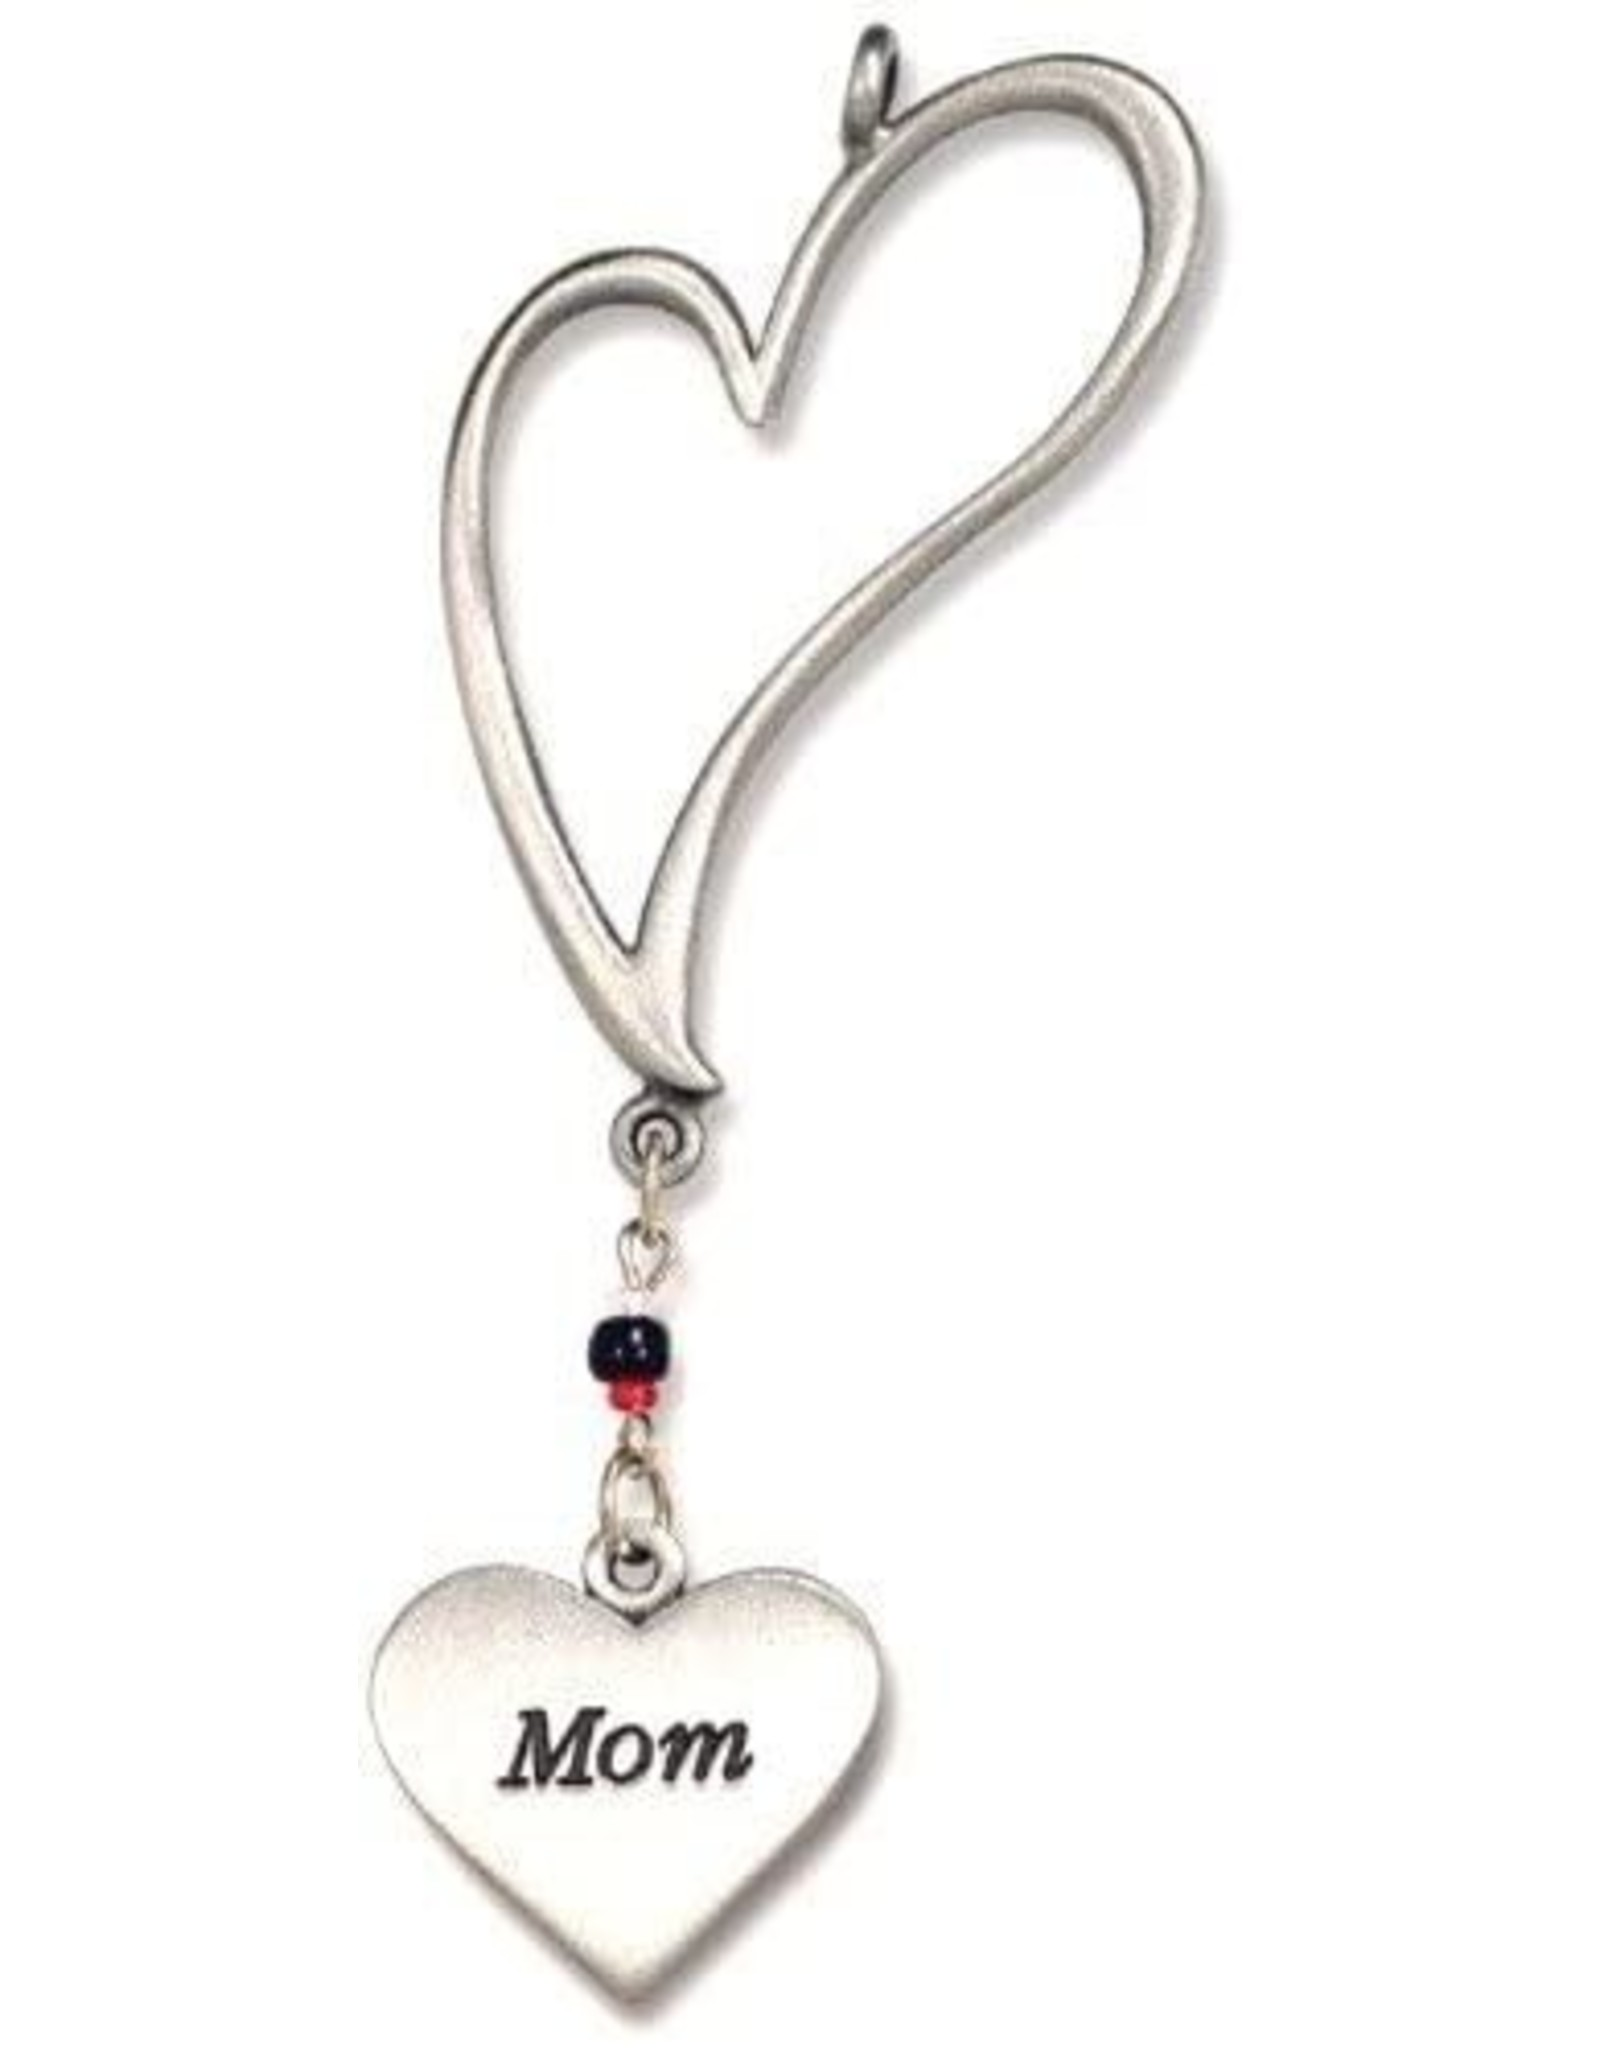 Car Charm - Mom